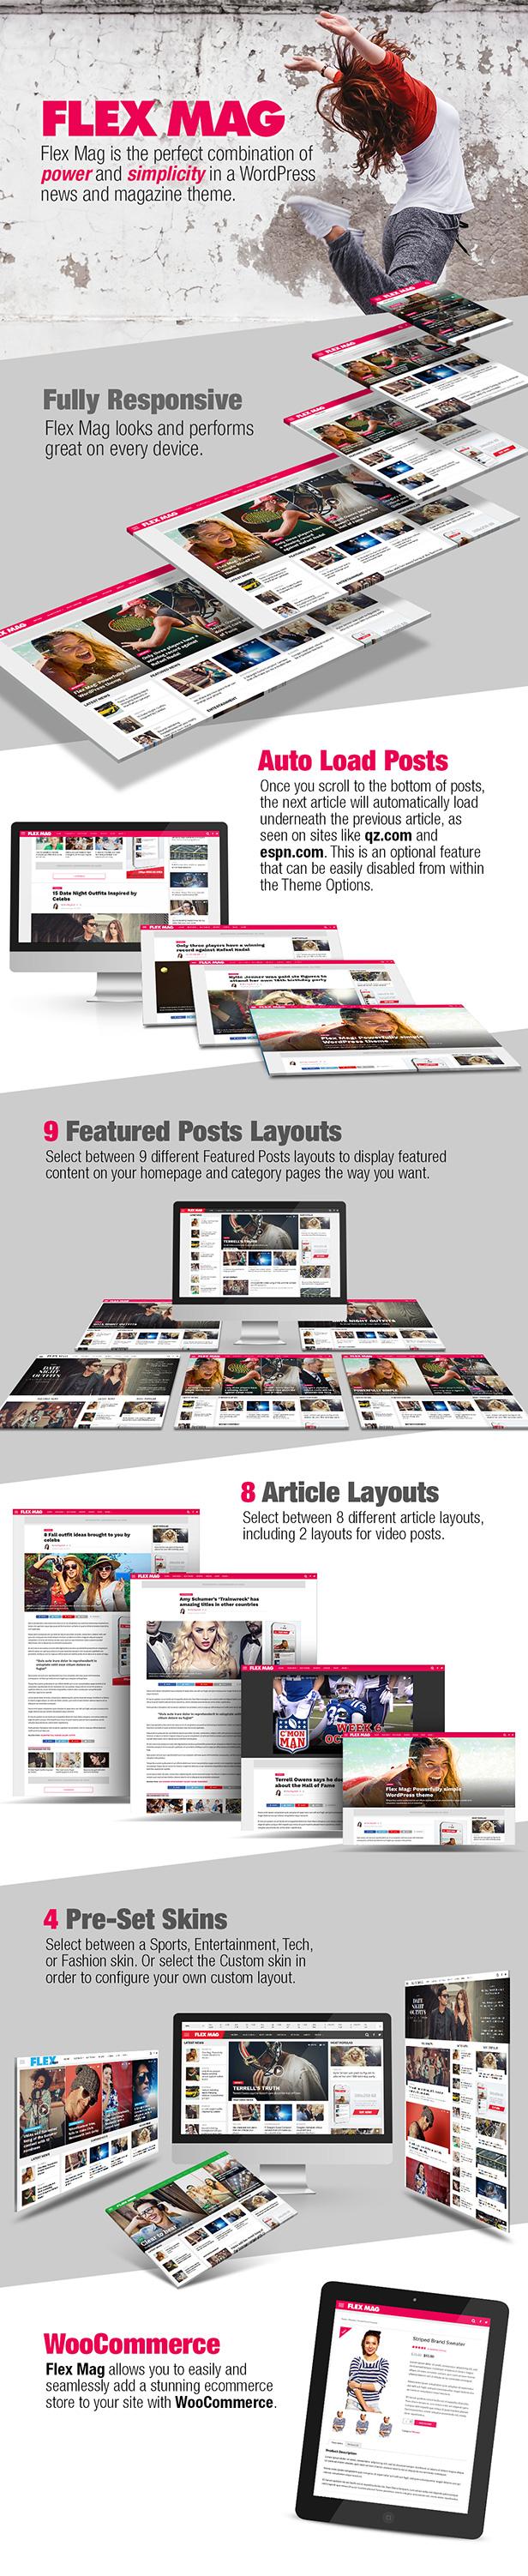 Flex Mag - Responsive WordPress News Theme - 1